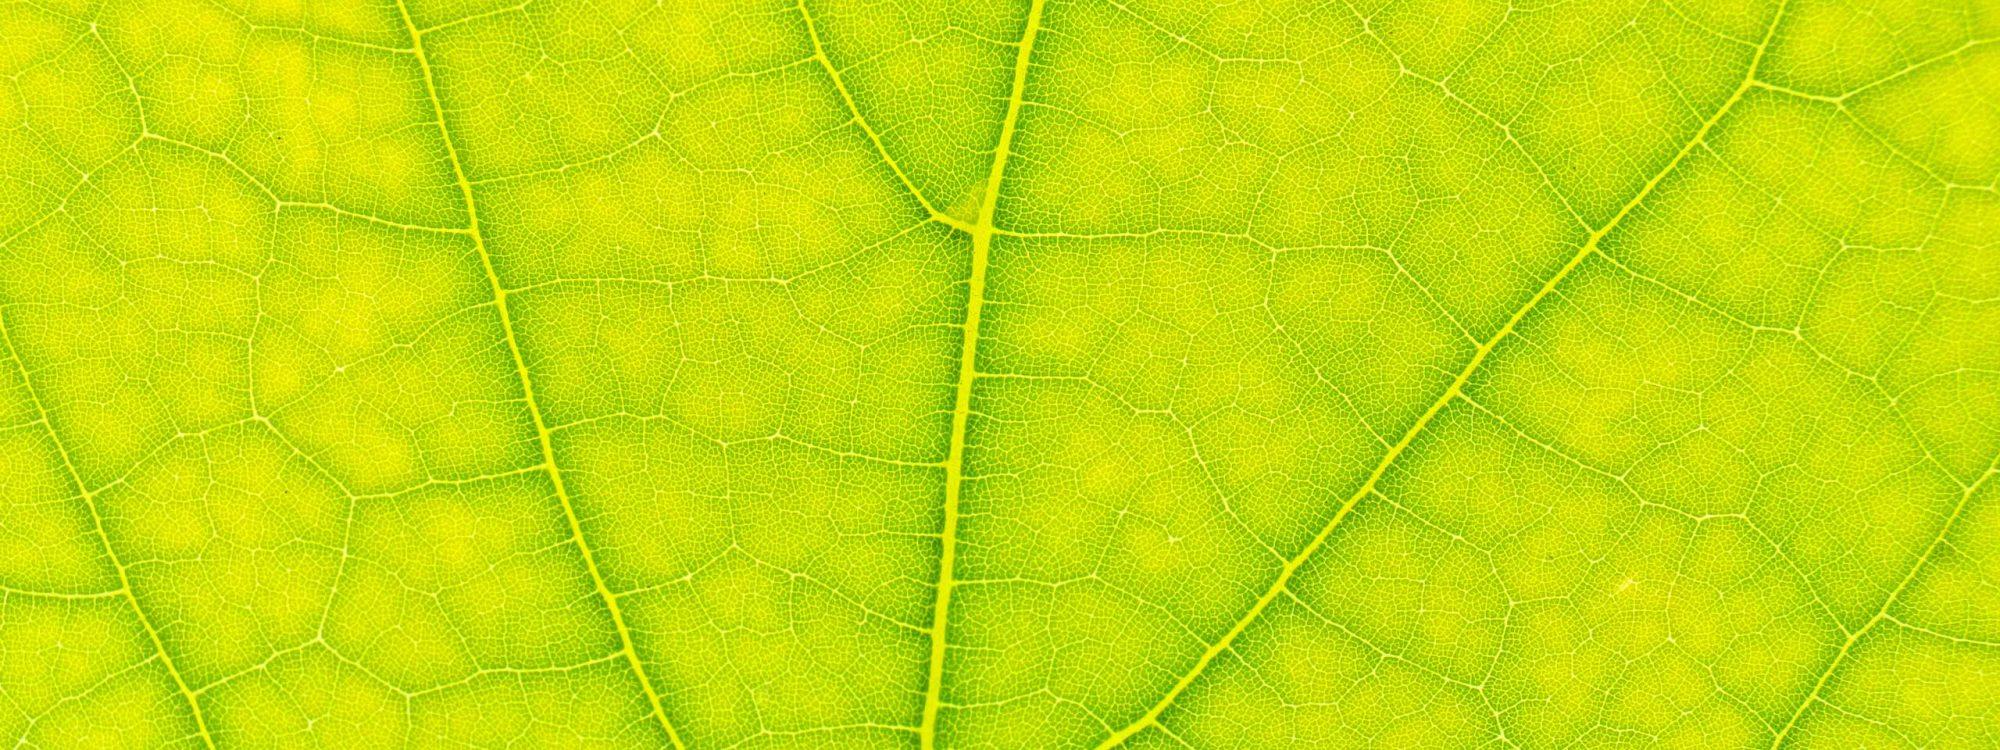 textura-vegetal-2